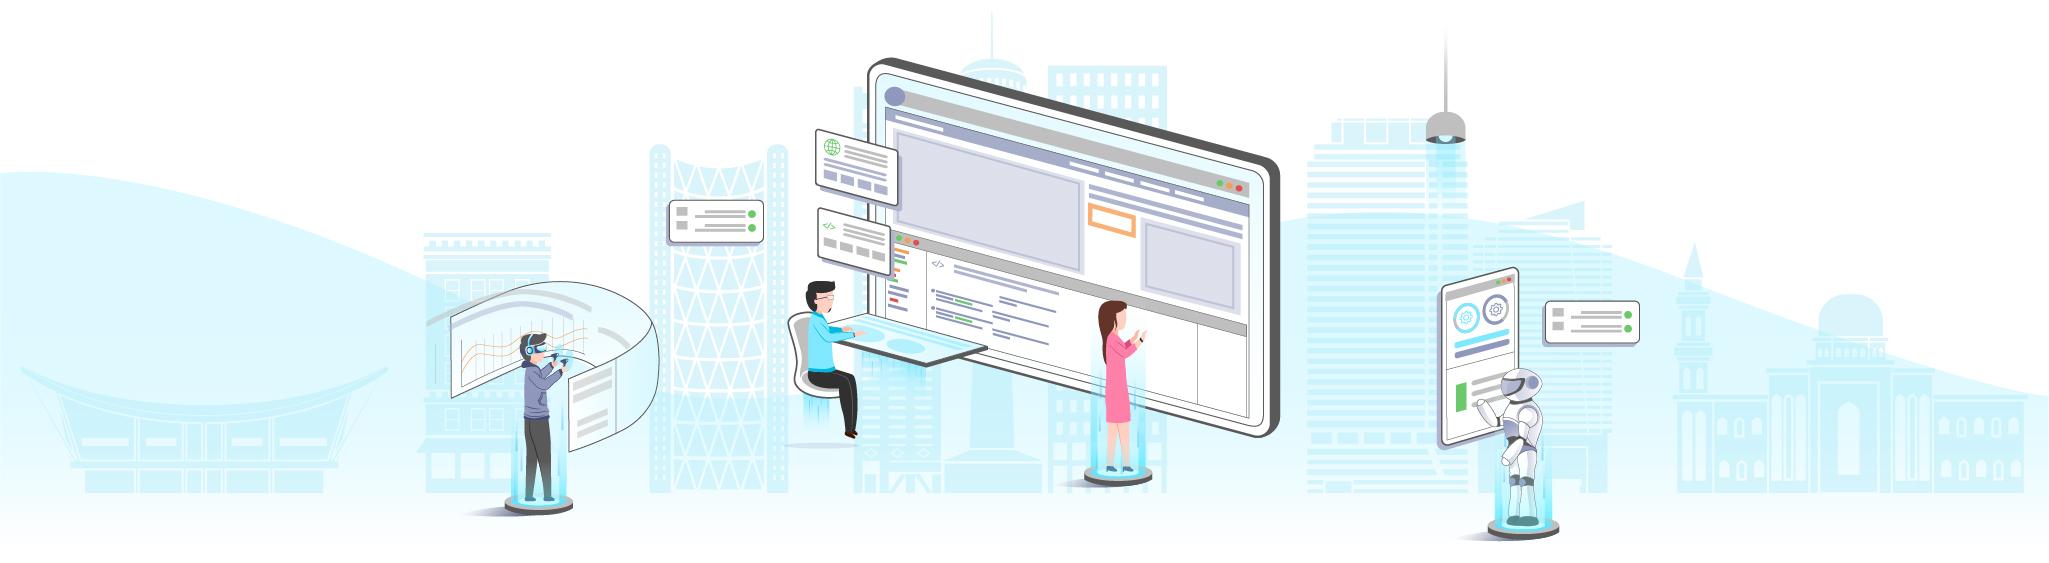 web development services in calgary